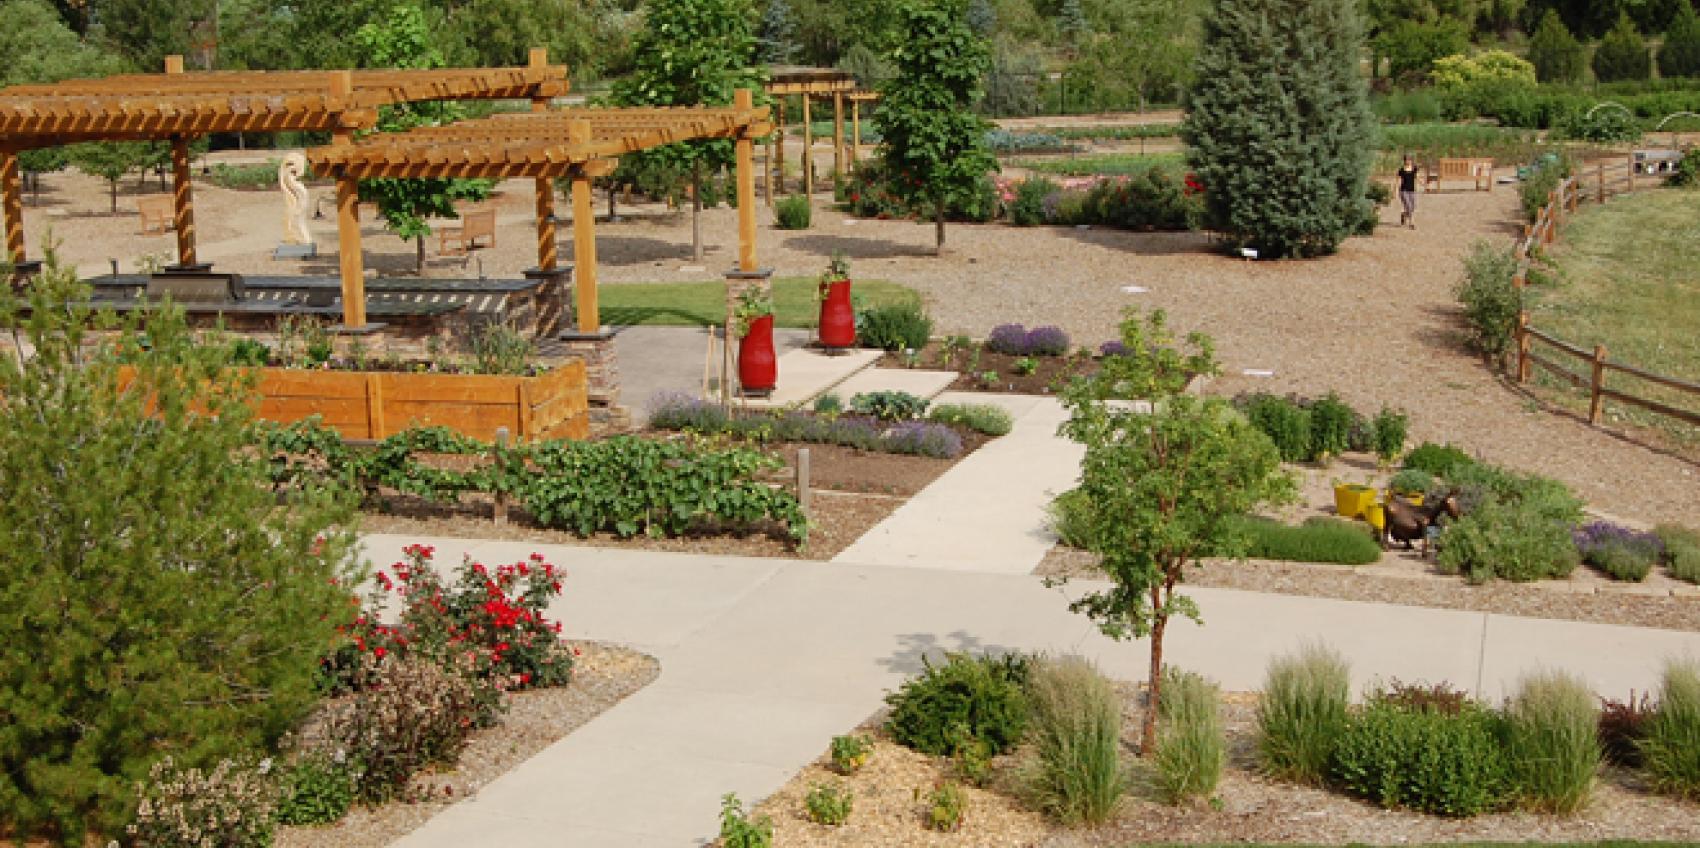 gardens on spring creek american public gardens association